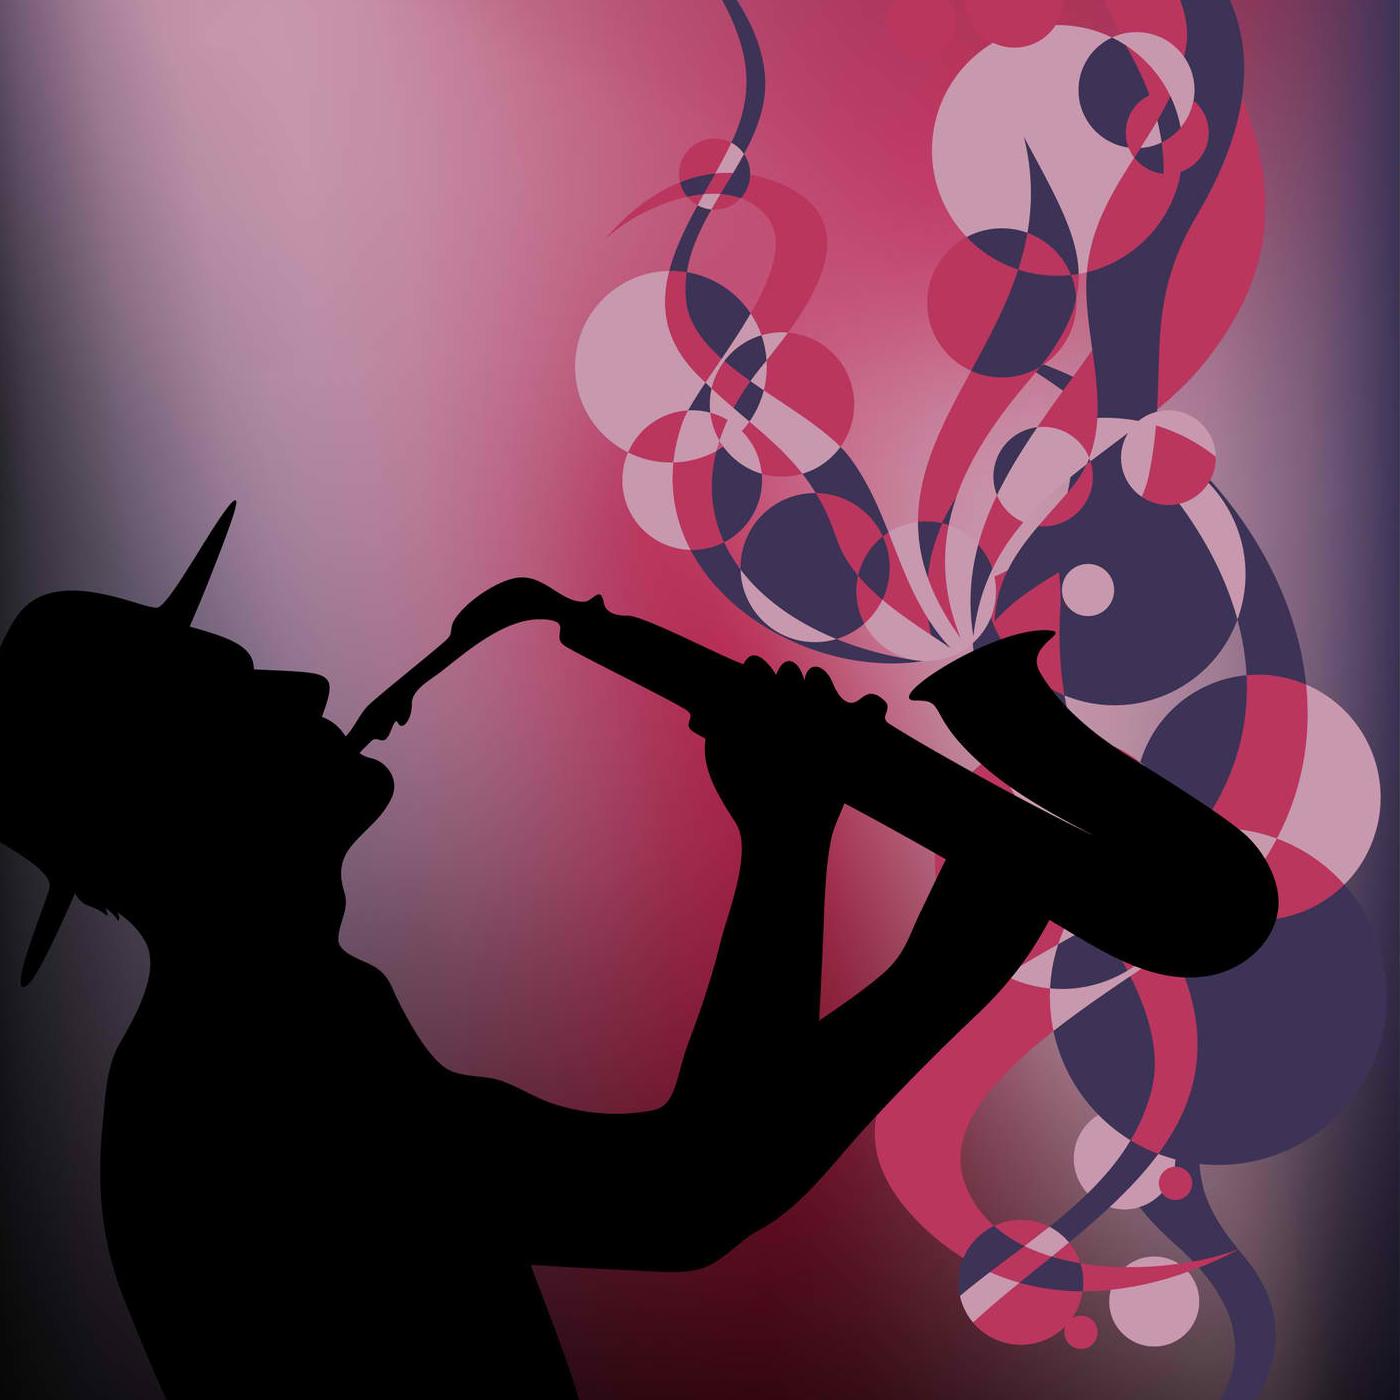 Contemporary Classic Mellow Smooth Jazz On Jazzradio Com Jazzradio Com